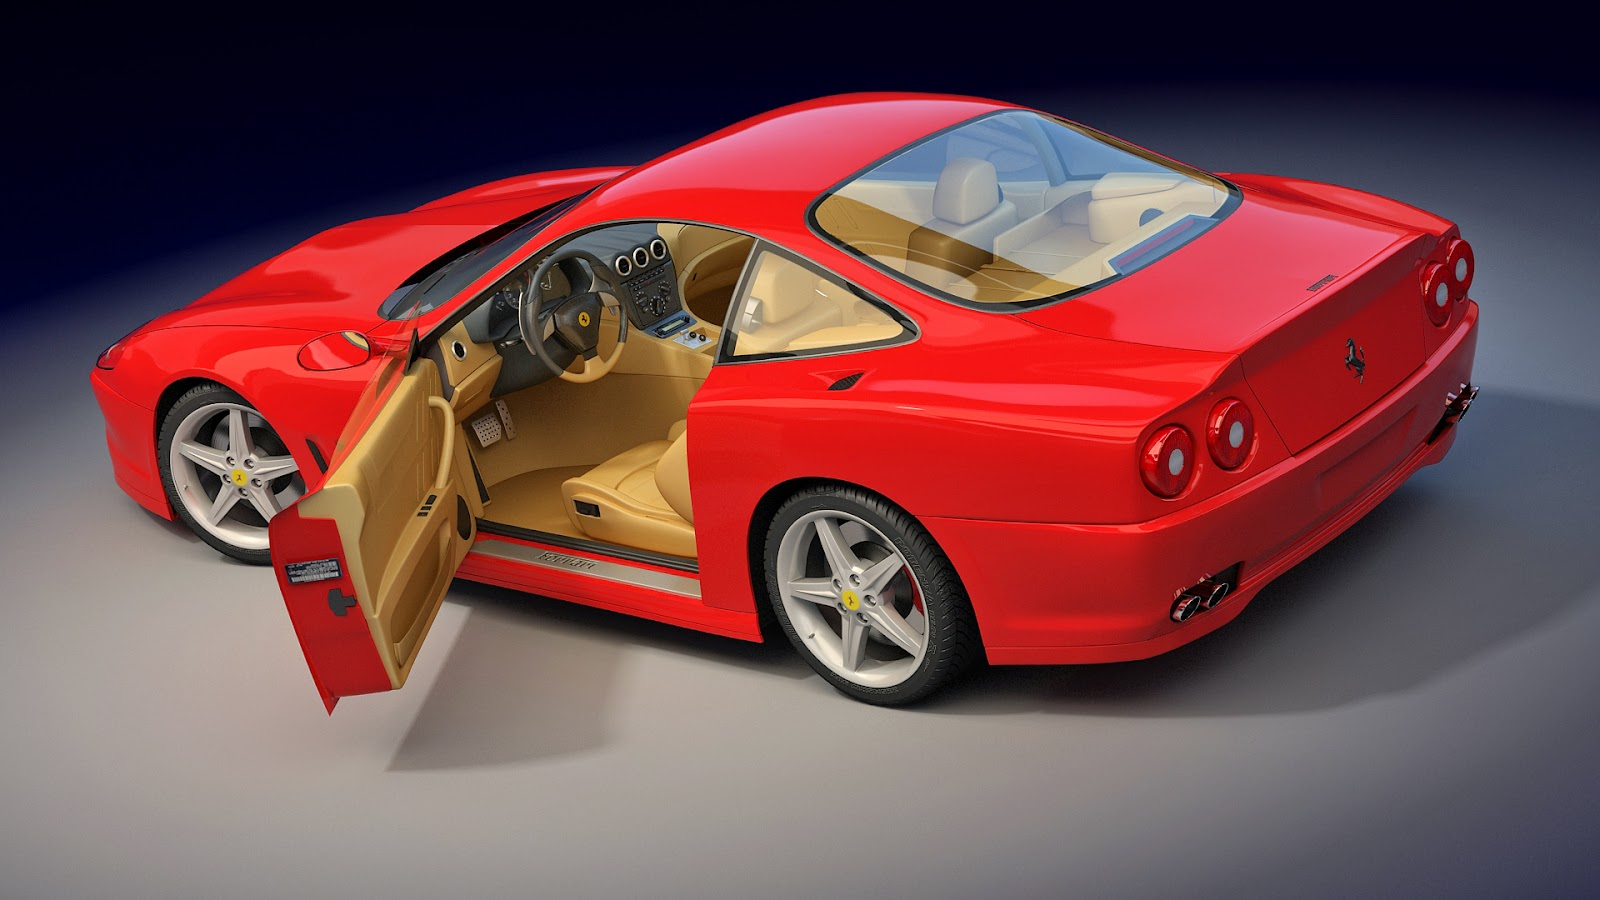 red car wallpaper free download